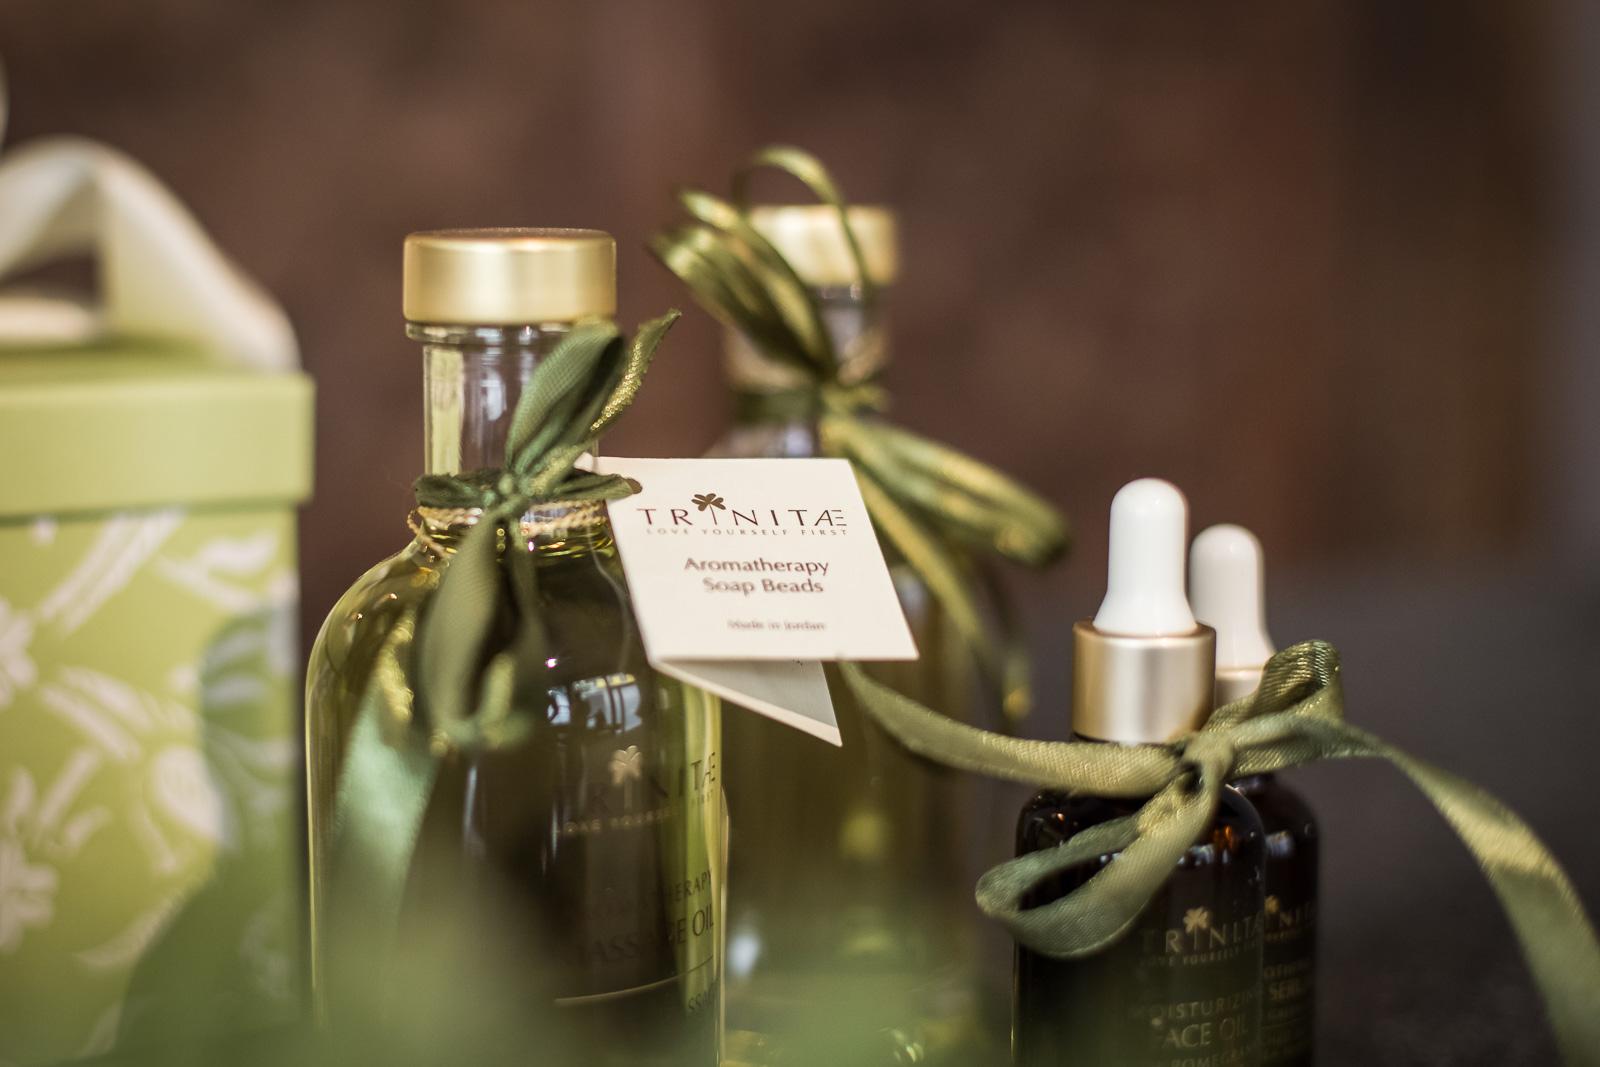 Businessfotografie-Trinitae-Bernadett Yehdou-Fotograf-Kosmetik-Produkte